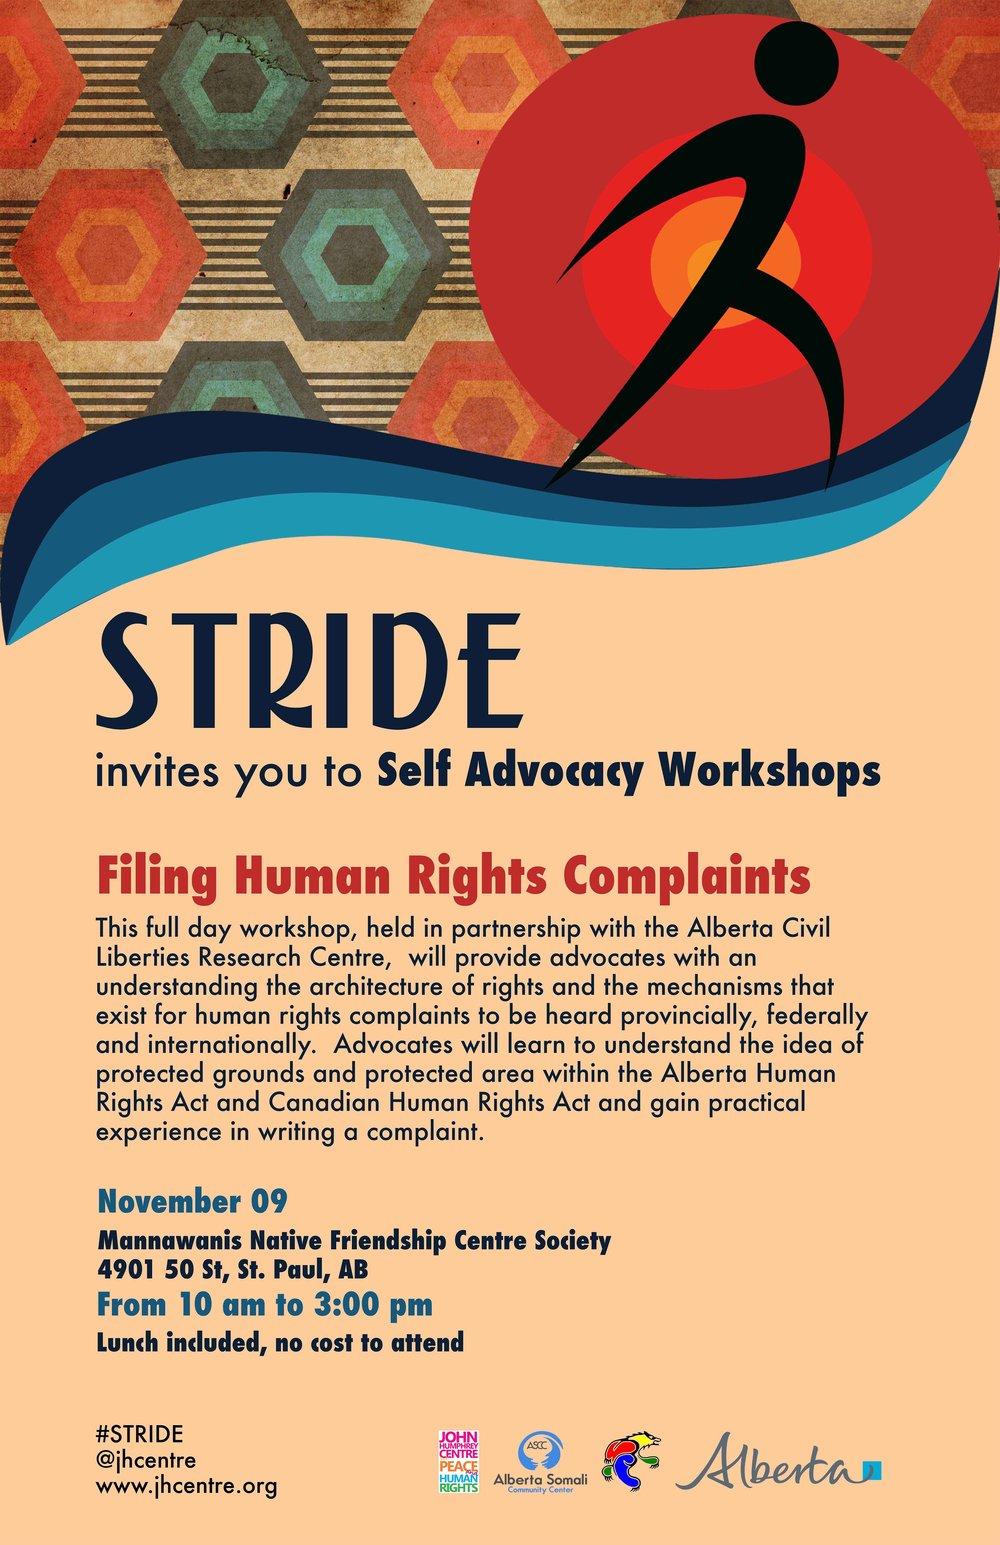 Stride-HumanRightsComplaints-Nov09-StPaul.jpg